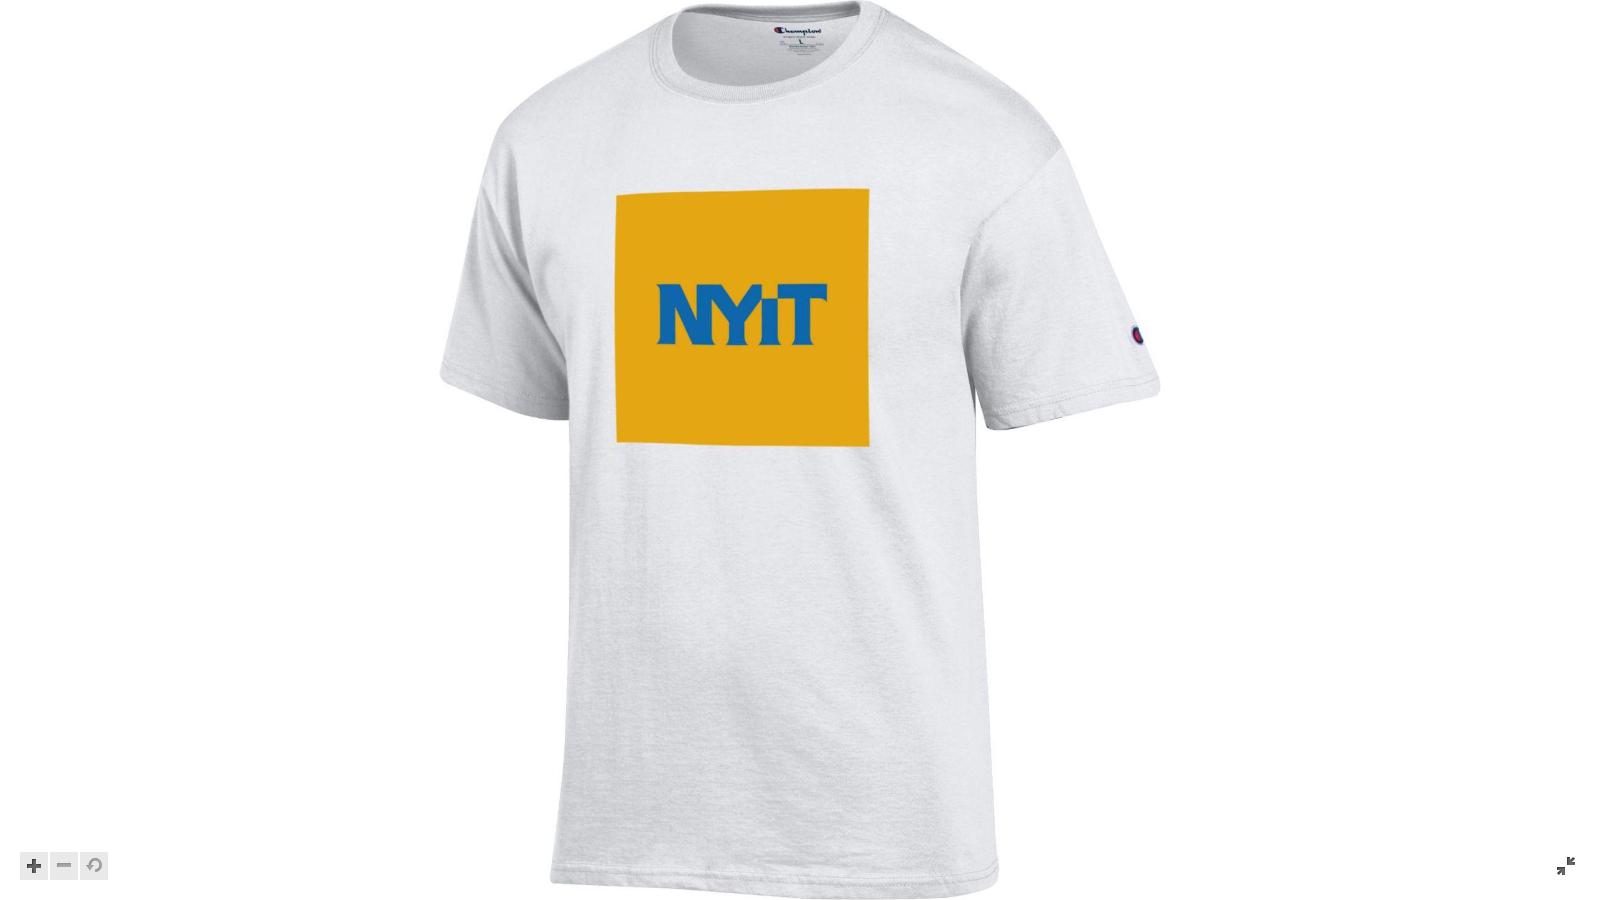 NYiT Short Sleeve T-Shirt